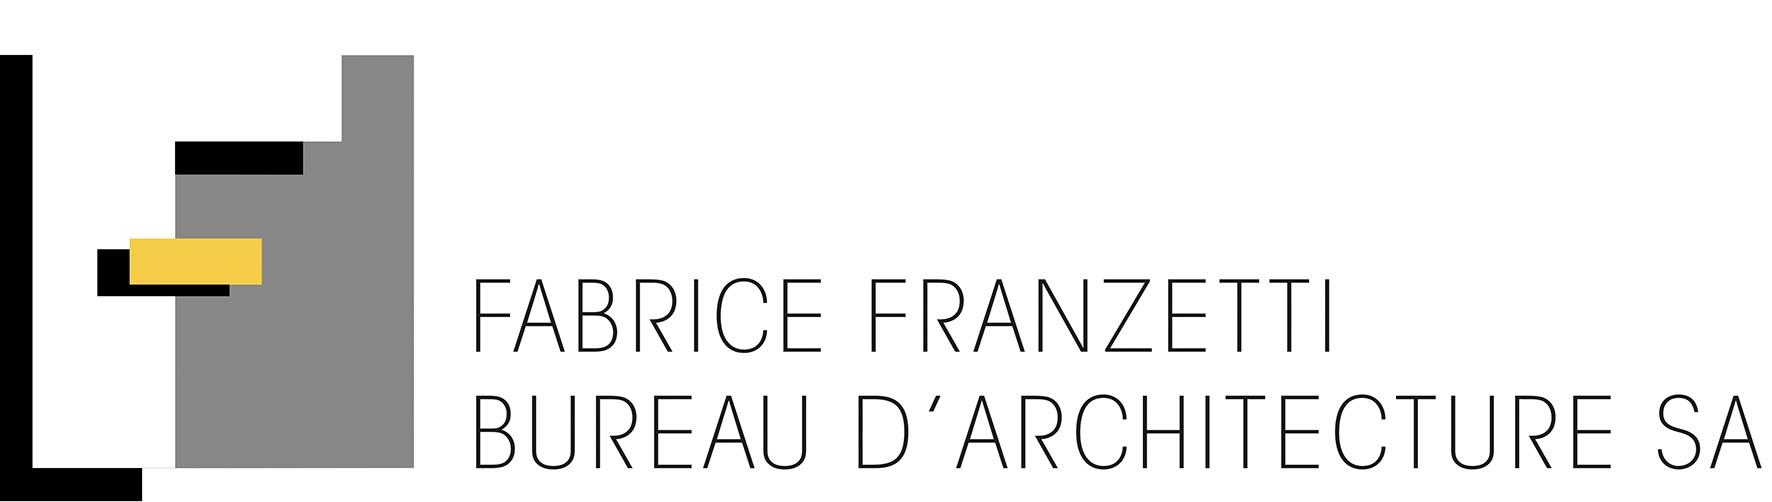 Bureau d'architecture Fabrice Franzetti SA